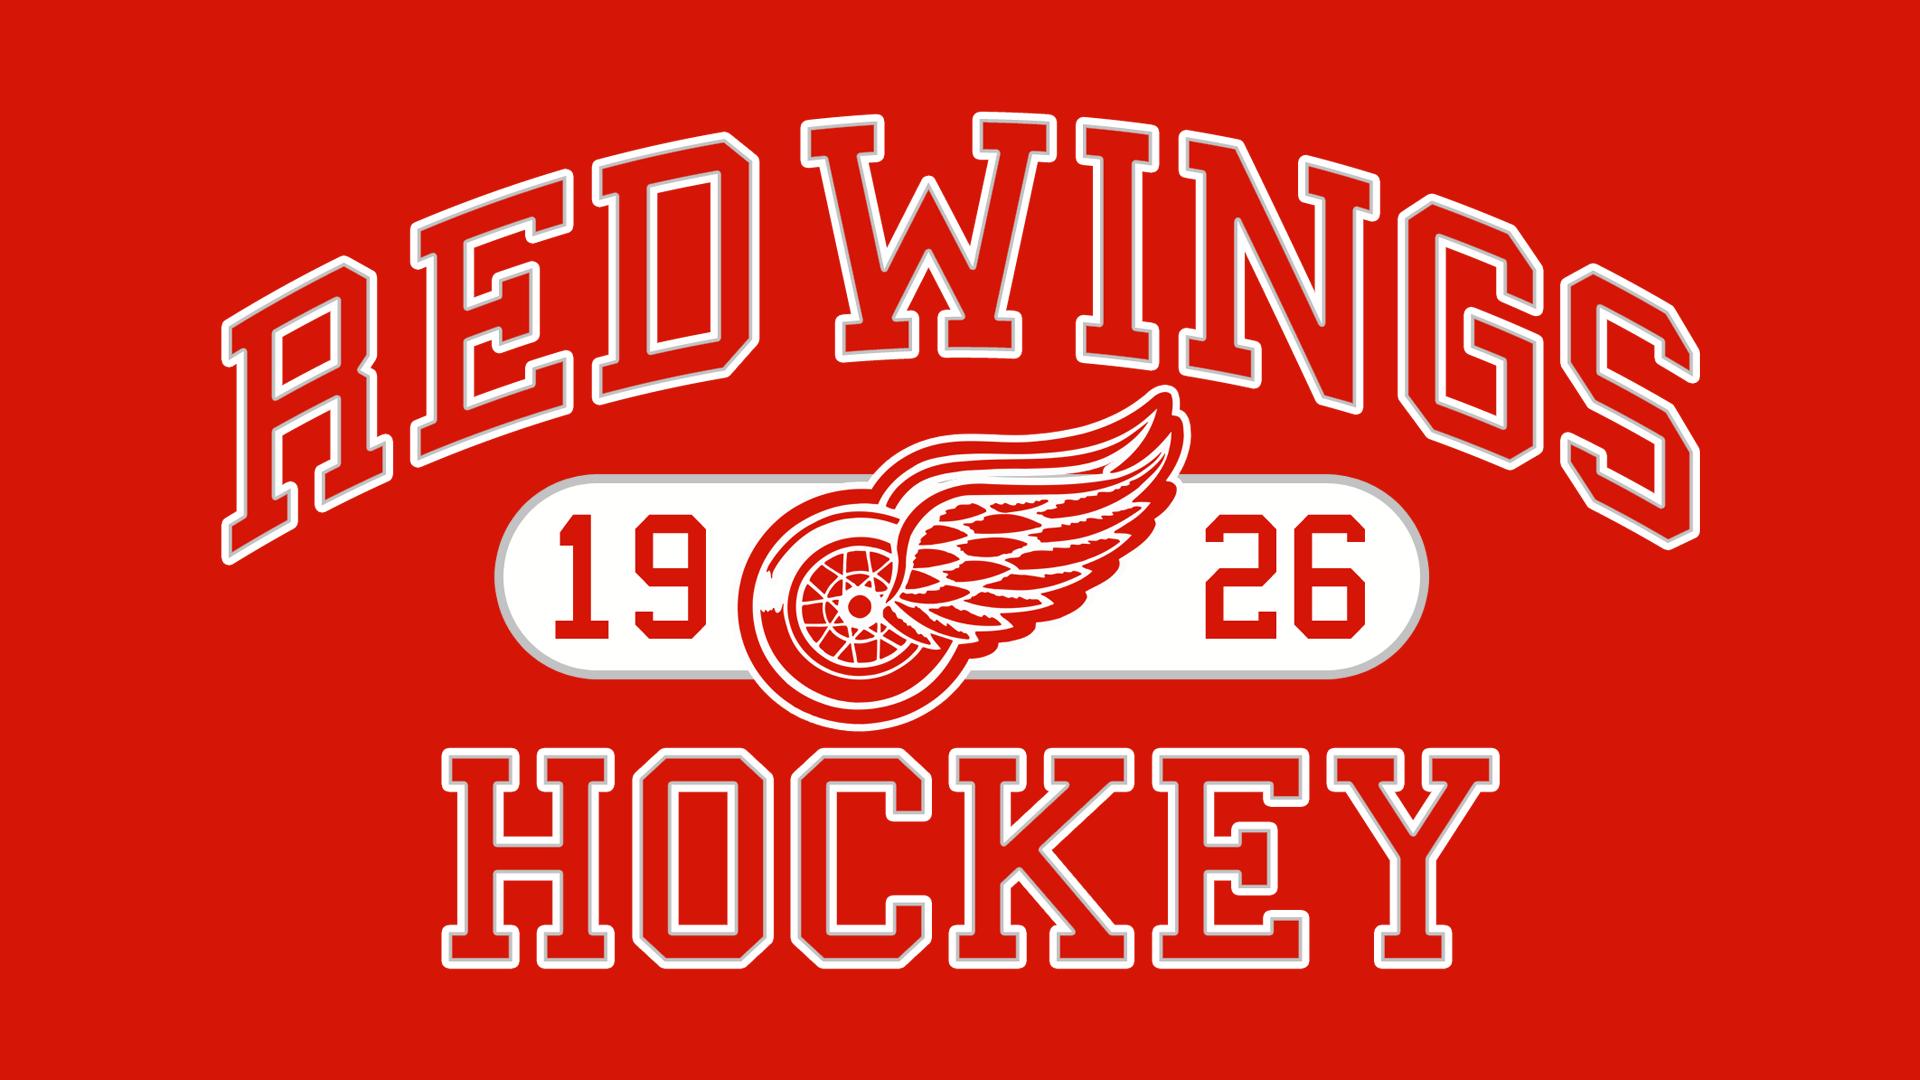 Detroit Red Wings Logo detroit red wings 1920x1080